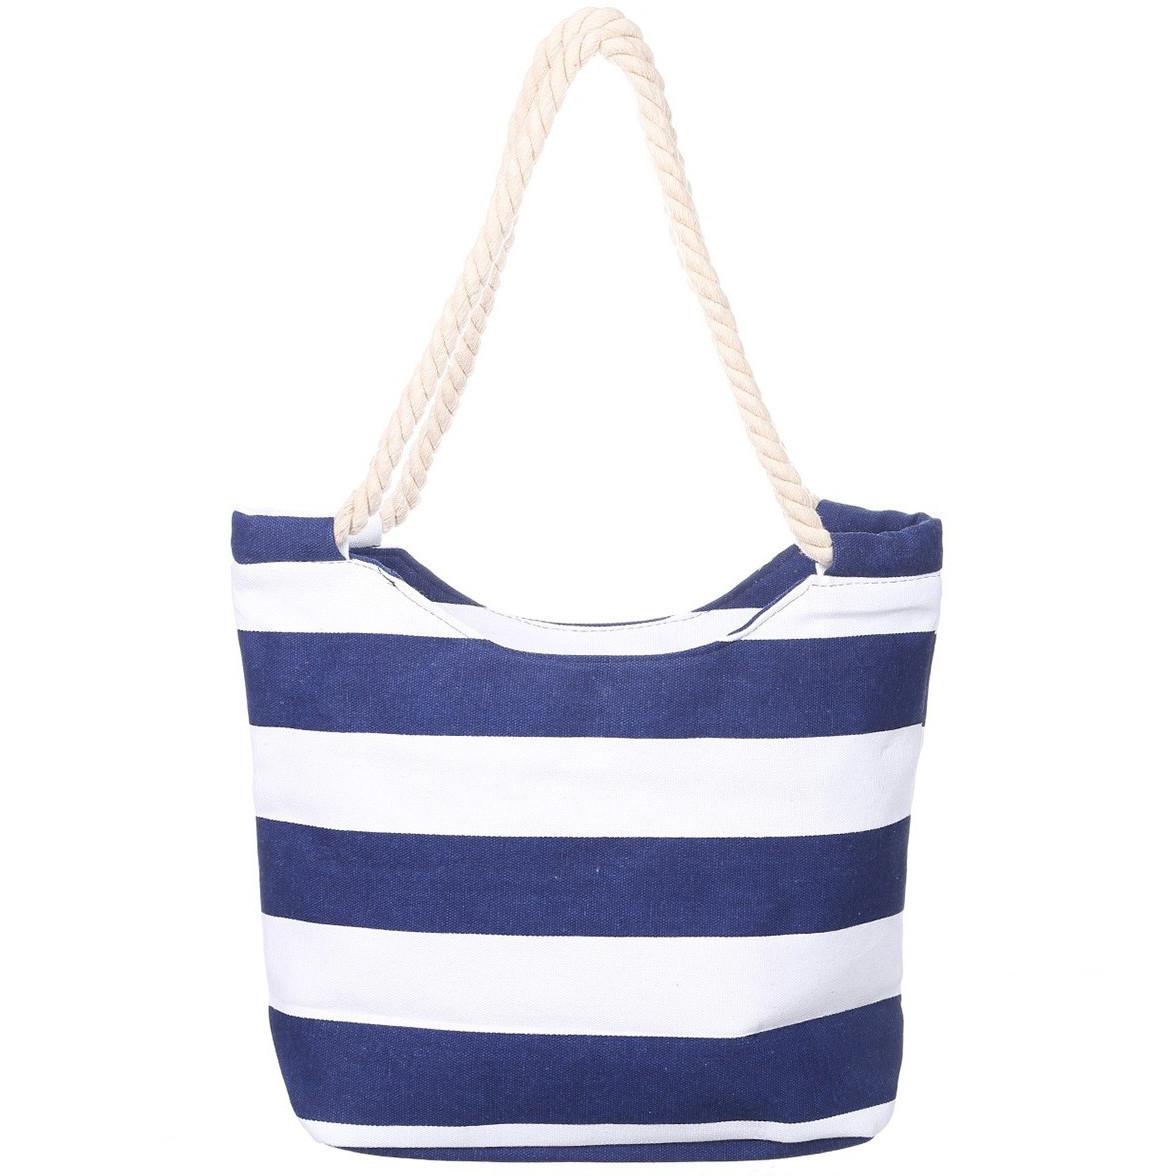 Уценка! Пляжная сумка УСС3522-95-2